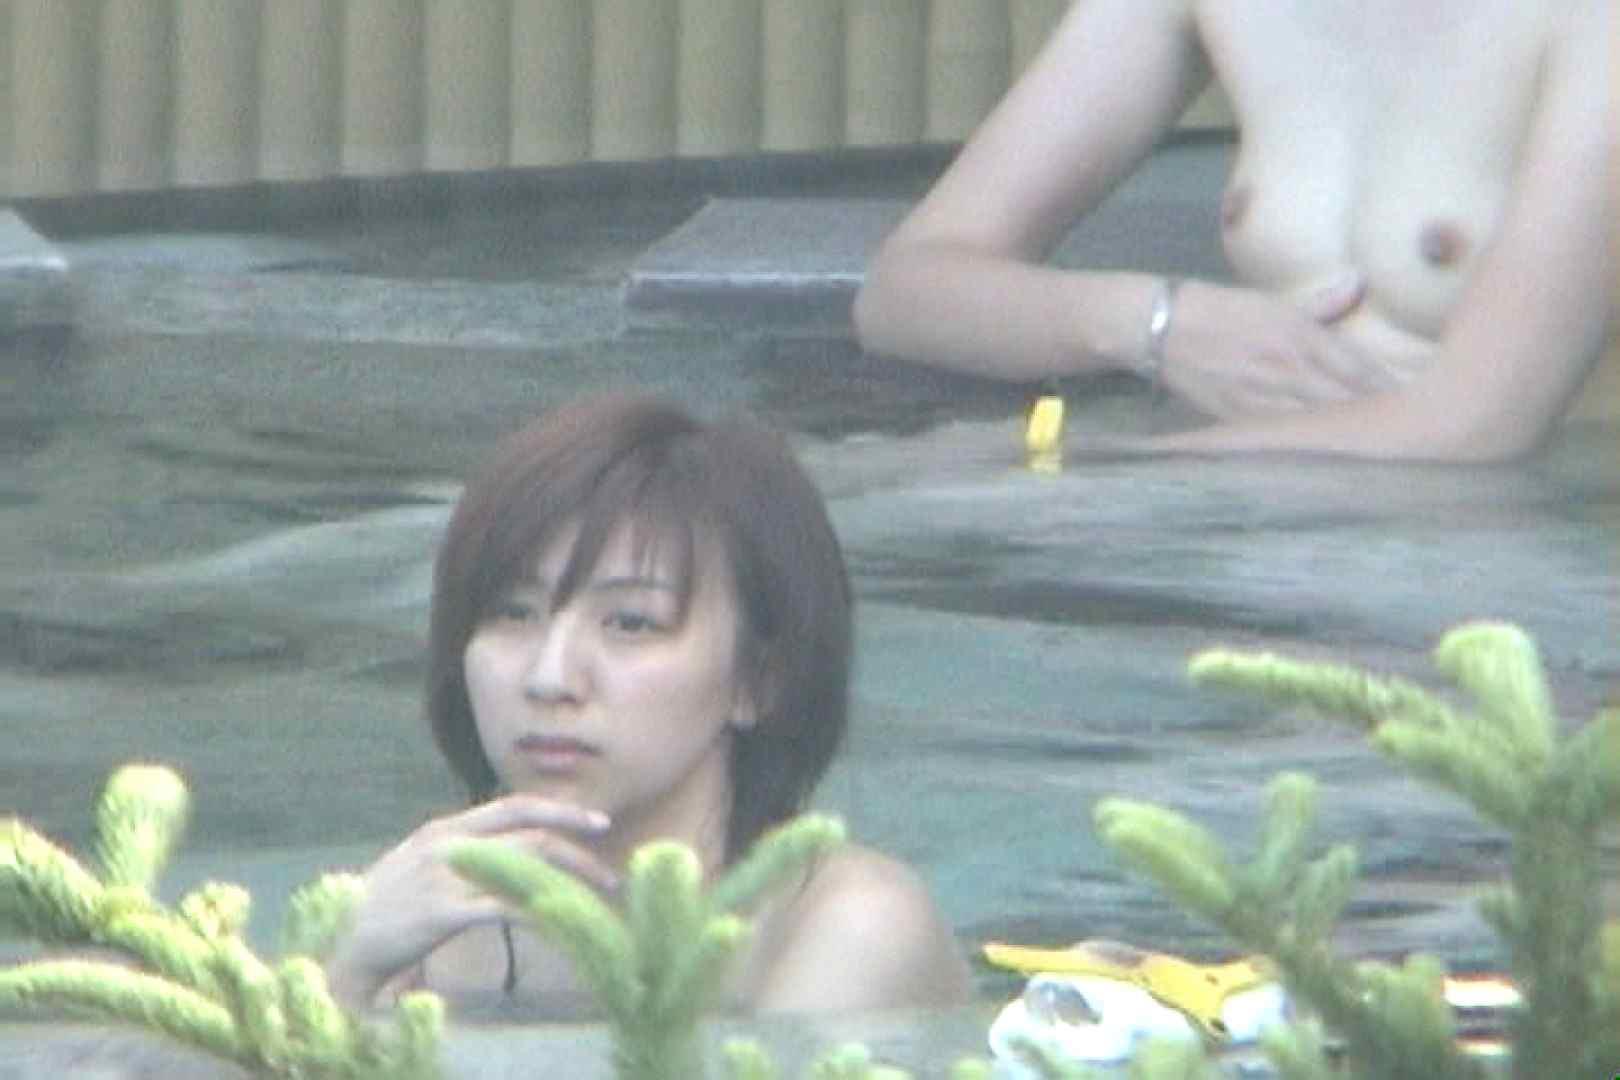 Aquaな露天風呂Vol.77【VIP限定】 露天   盗撮特集  98画像 98